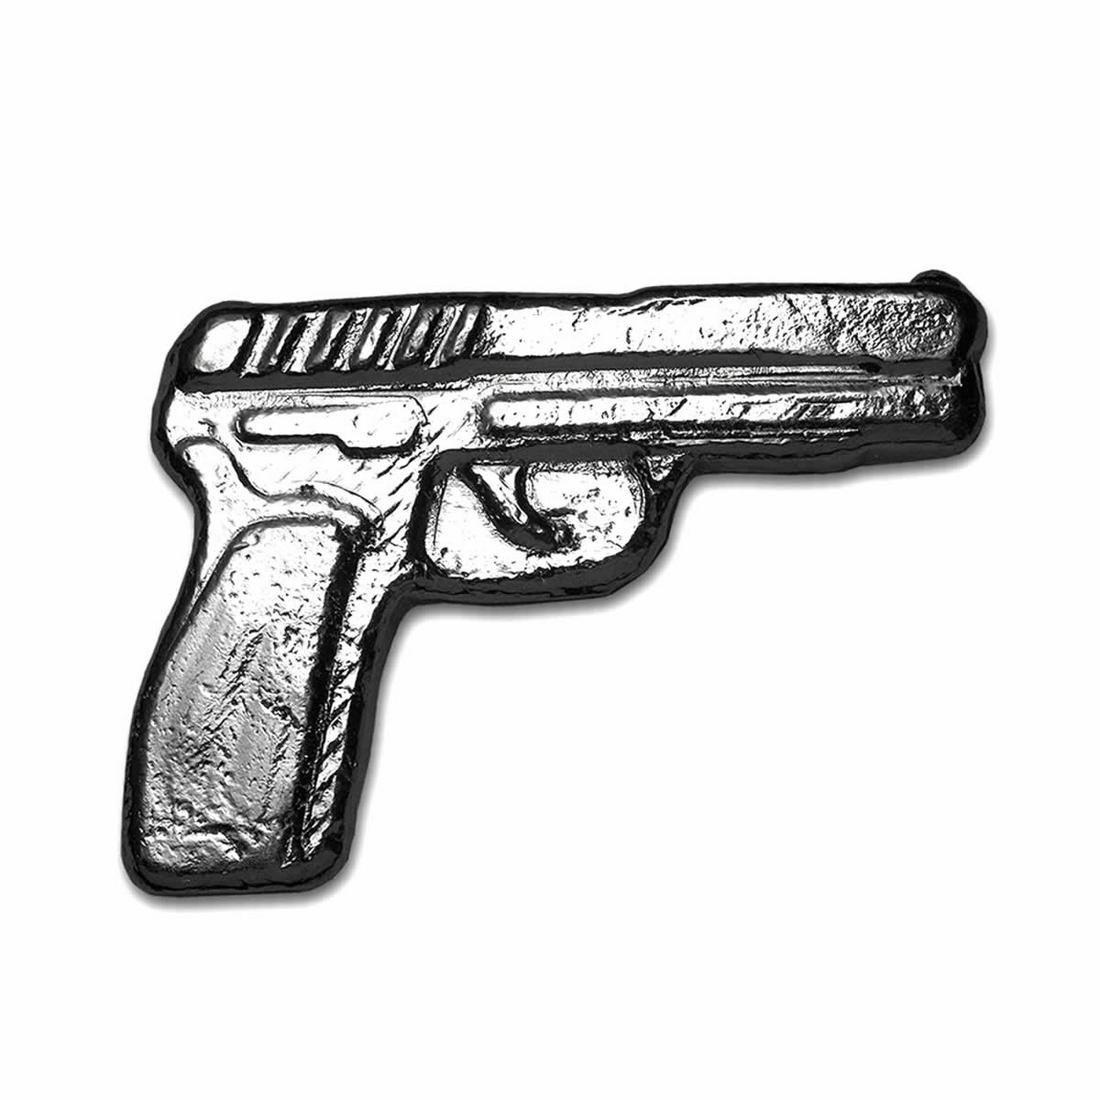 2 oz .999 Fine Silver Gun - 3D Poured Bar Pistol Handgu